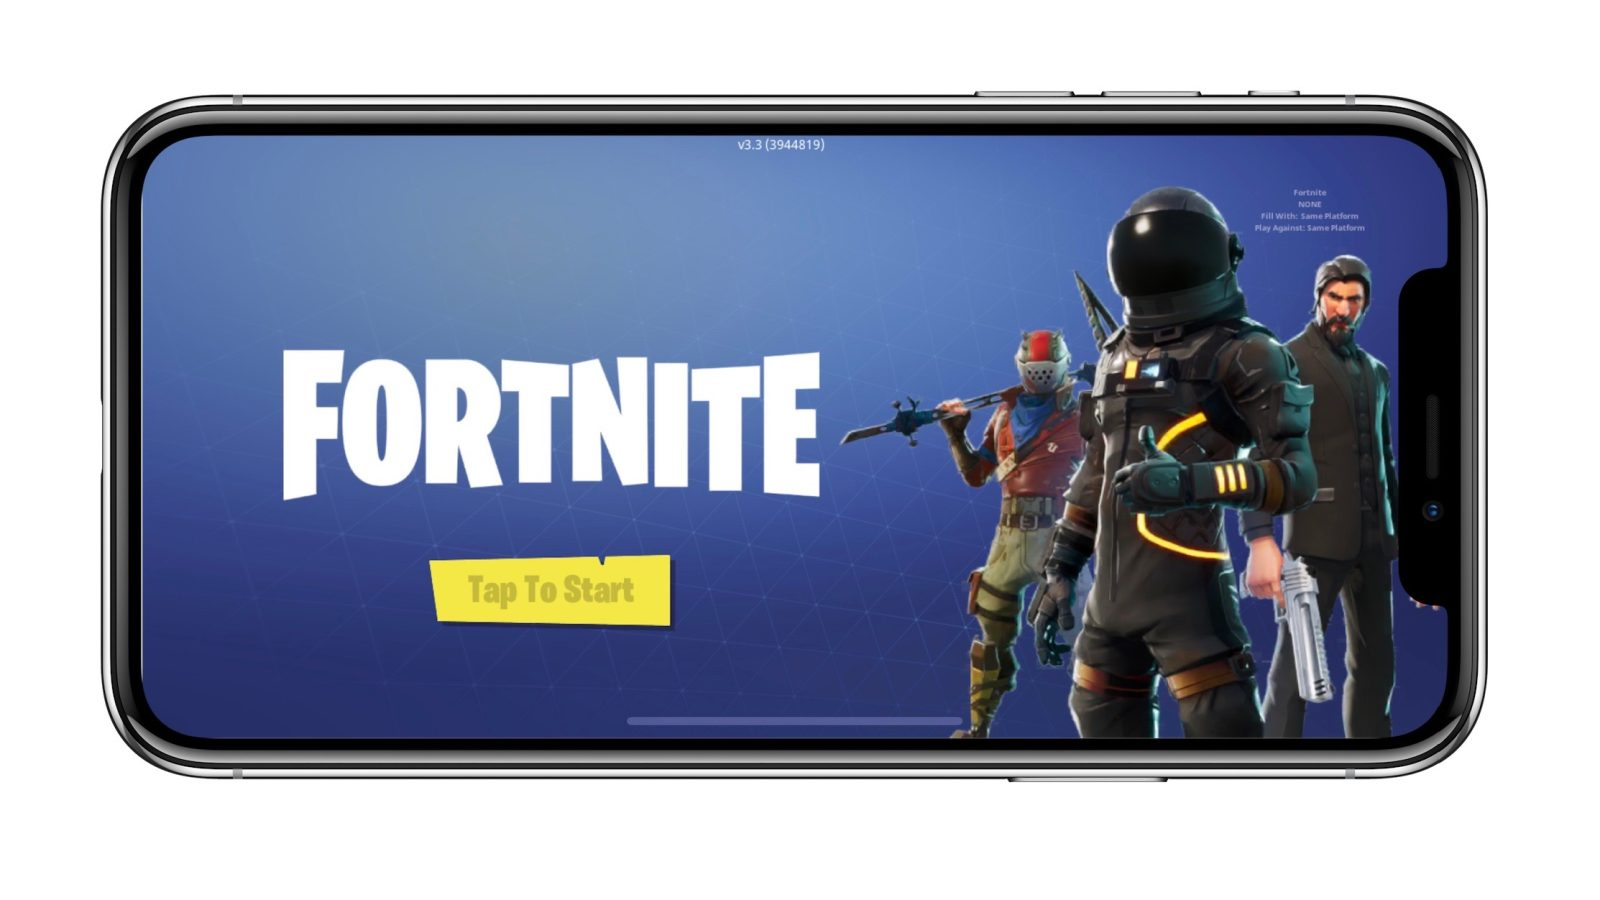 Fortnite iOS : 300 millions de dollars de revenus en 200 jours